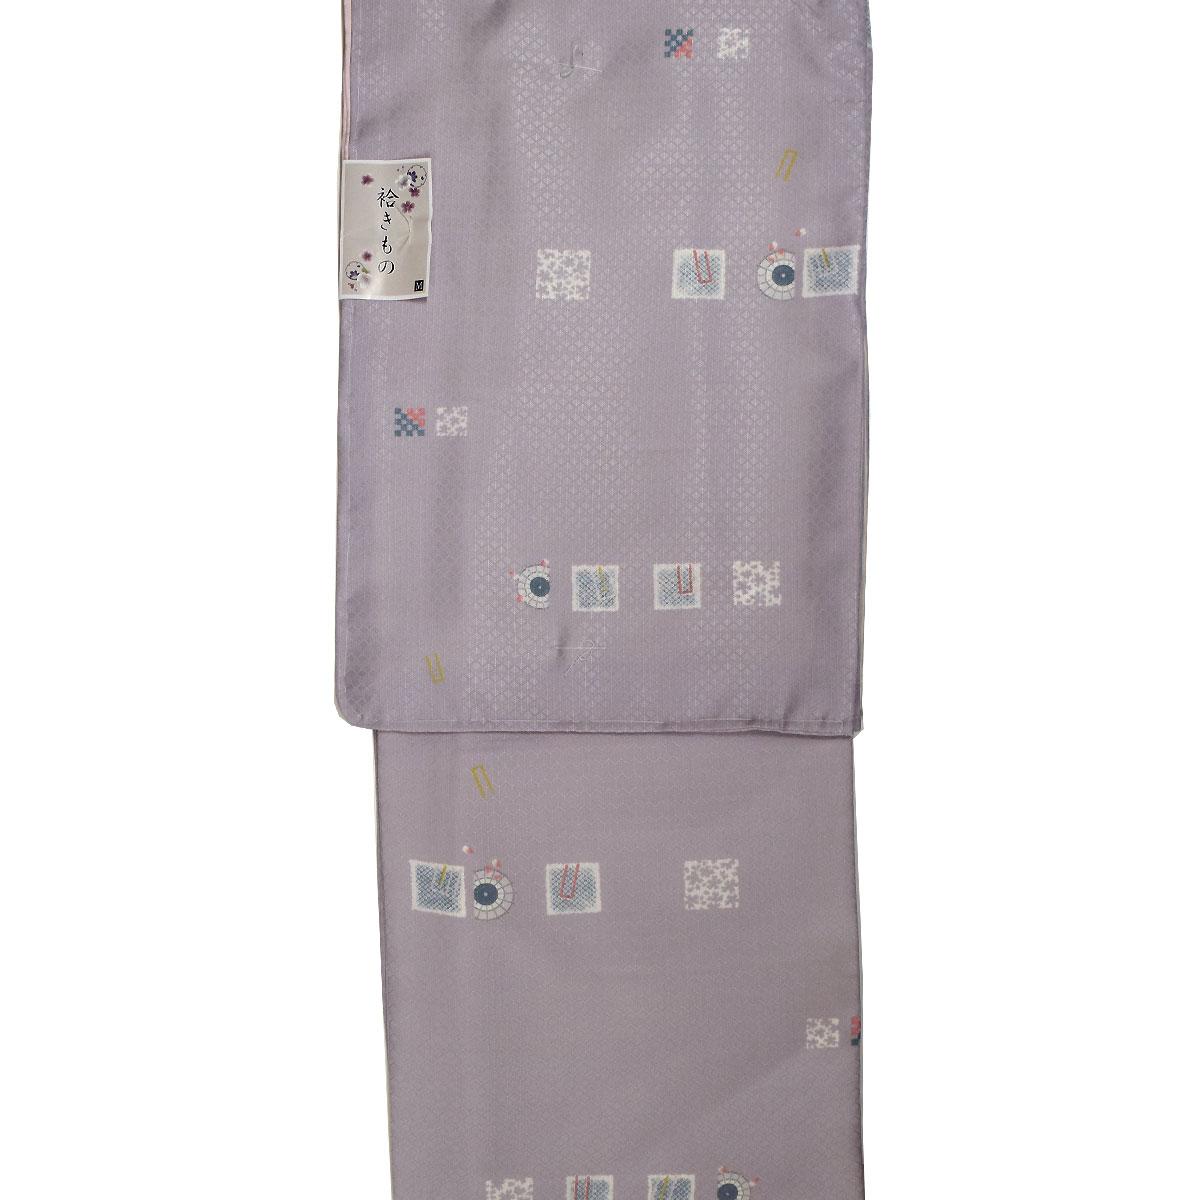 【M寸】 上質生地 仕立て上がり 袷 洗える着物 【単品】番号c902-37m kimono washable